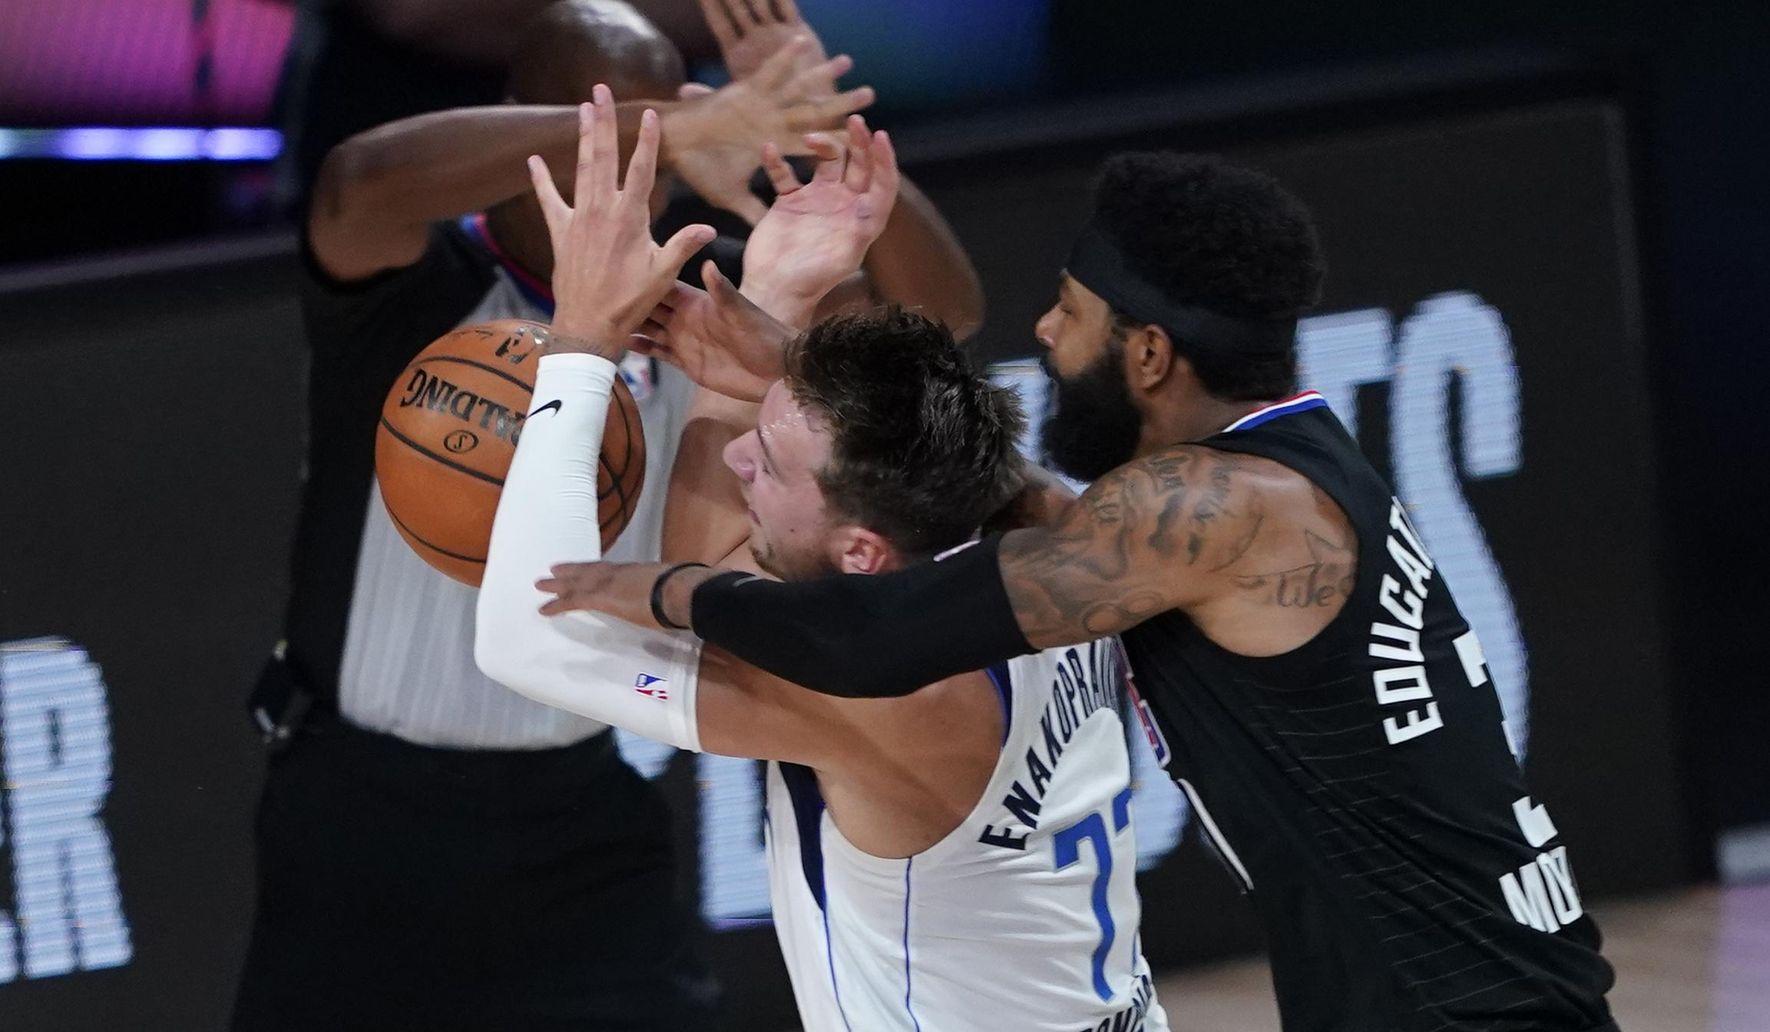 Mavericks_talking_tough_basketball_75819_c0-127-2306-1471_s1770x1032